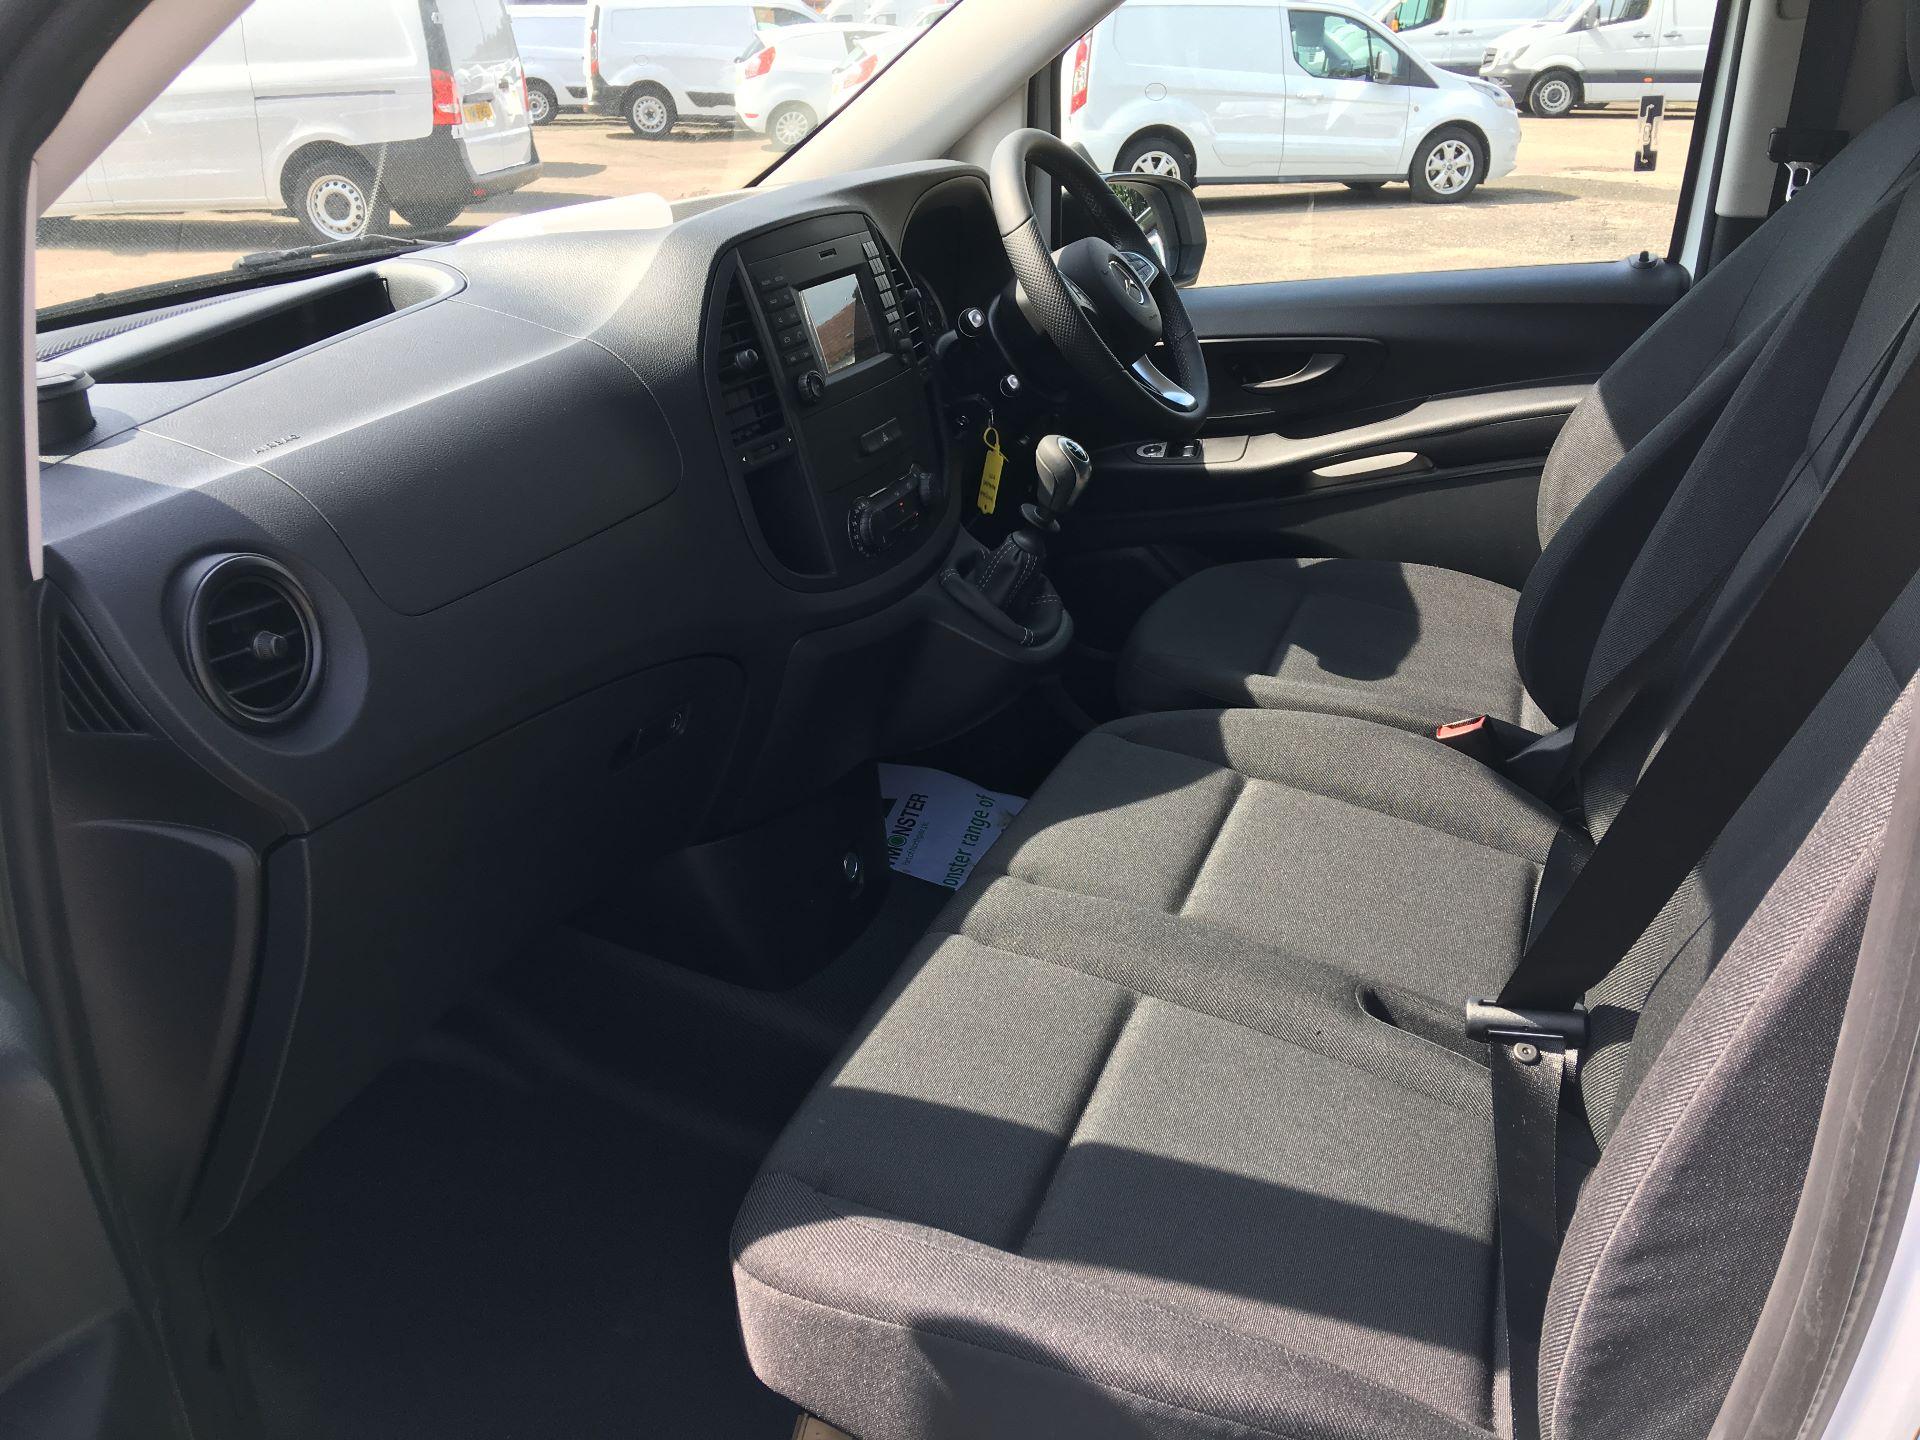 2019 Mercedes-Benz Vito LONG 111 CDI VAN EURO 5/6 (YN19ZGM) Image 17